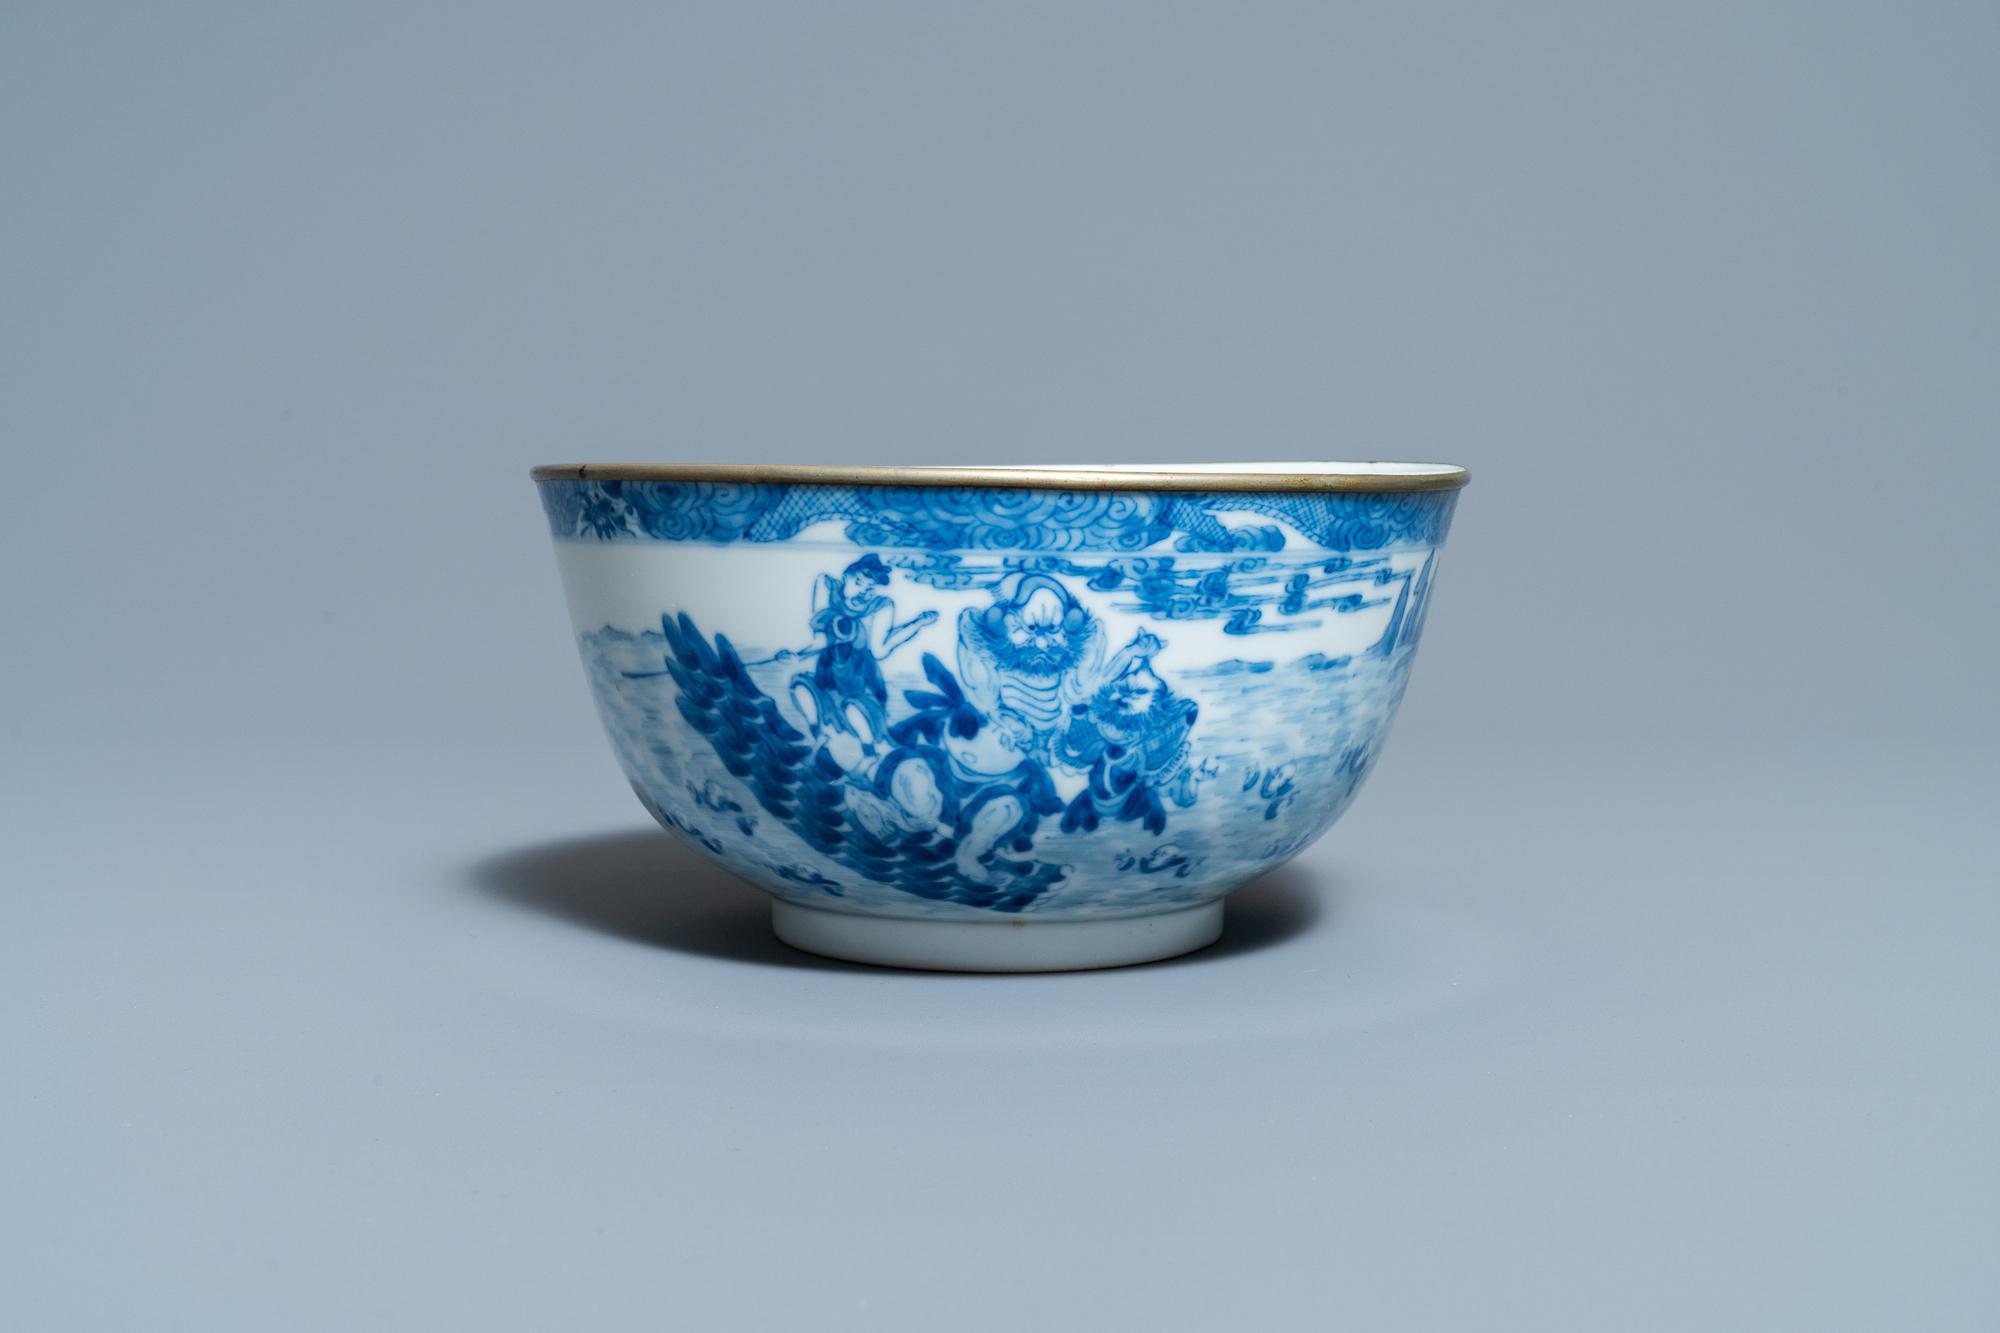 A Chinese blue and white Vietnamese market 'Bleu de Hue' bowl, Kangxi mark, 19th C. - Image 4 of 7